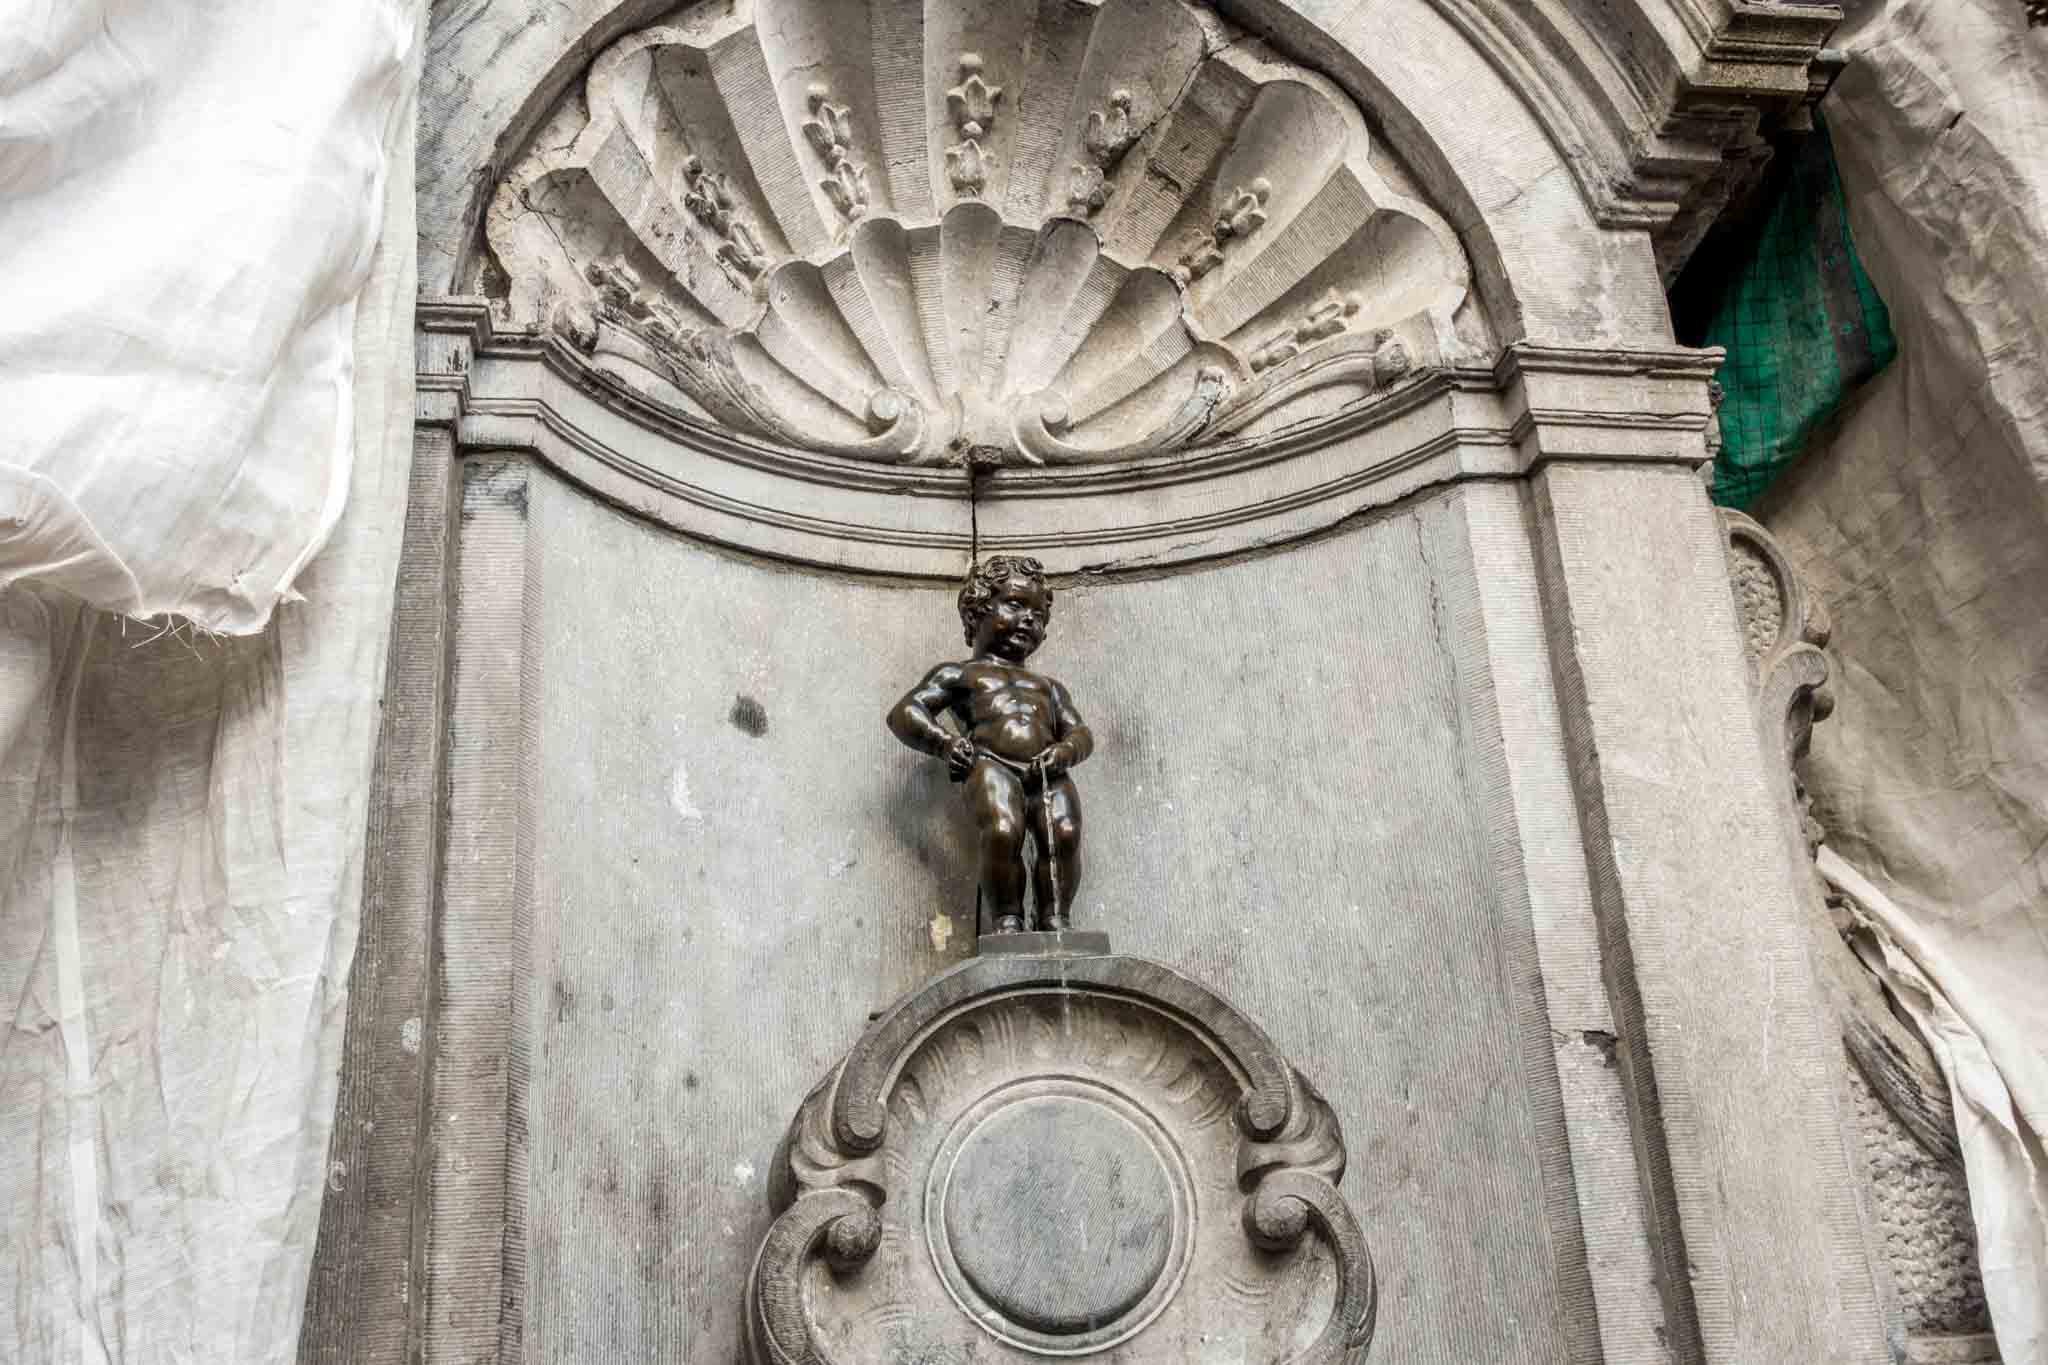 Manneken Pis, statue of a little boy peeing, in Brussels Belgium